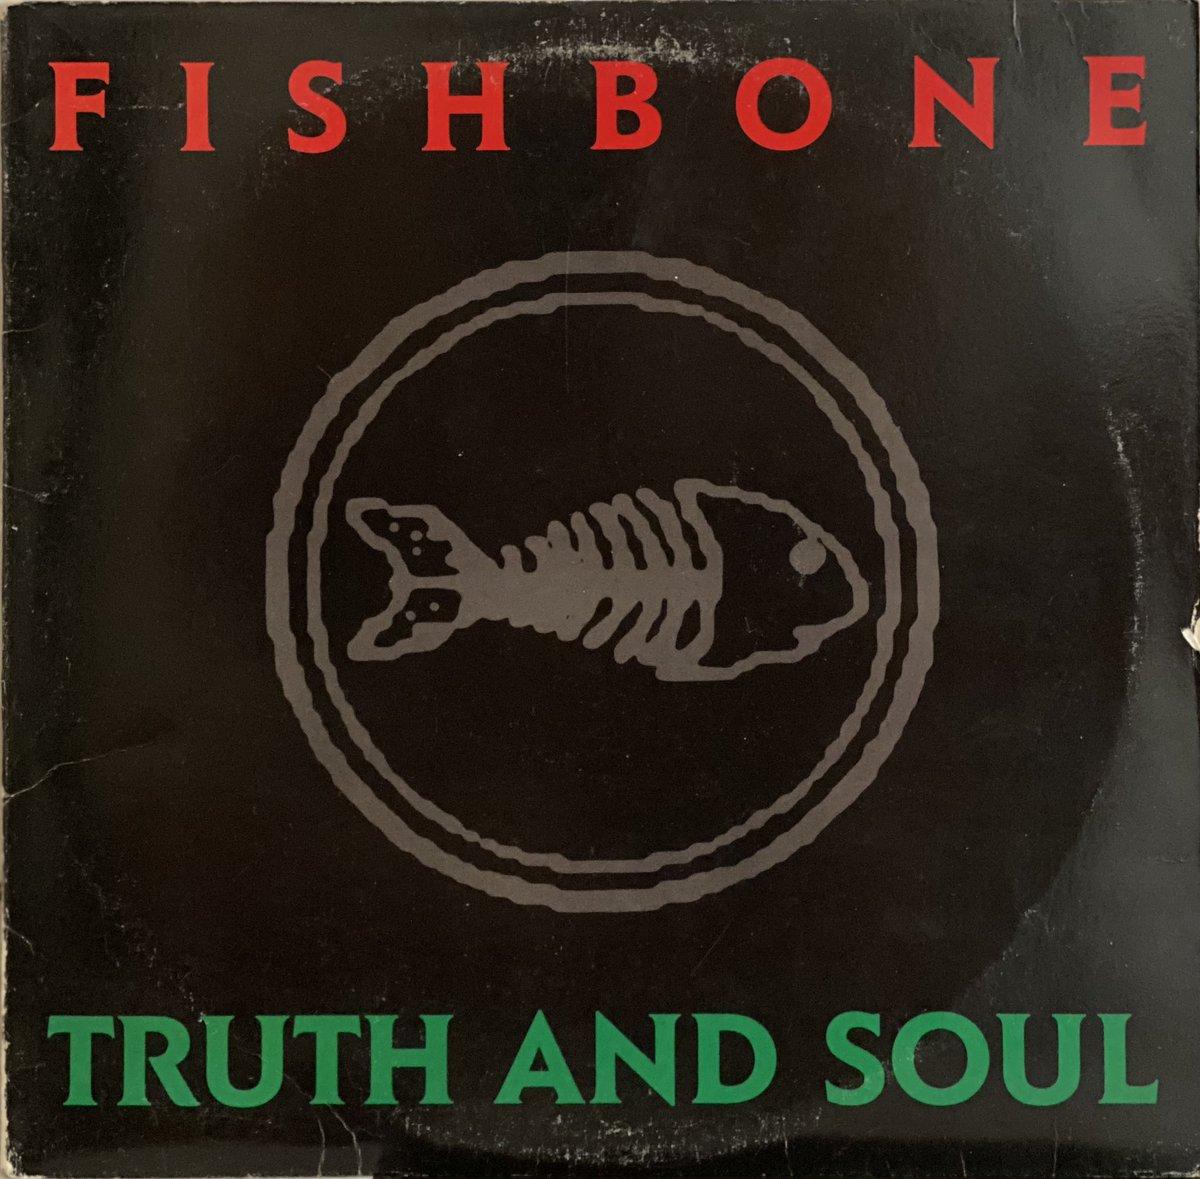 FishboneSoldier photo